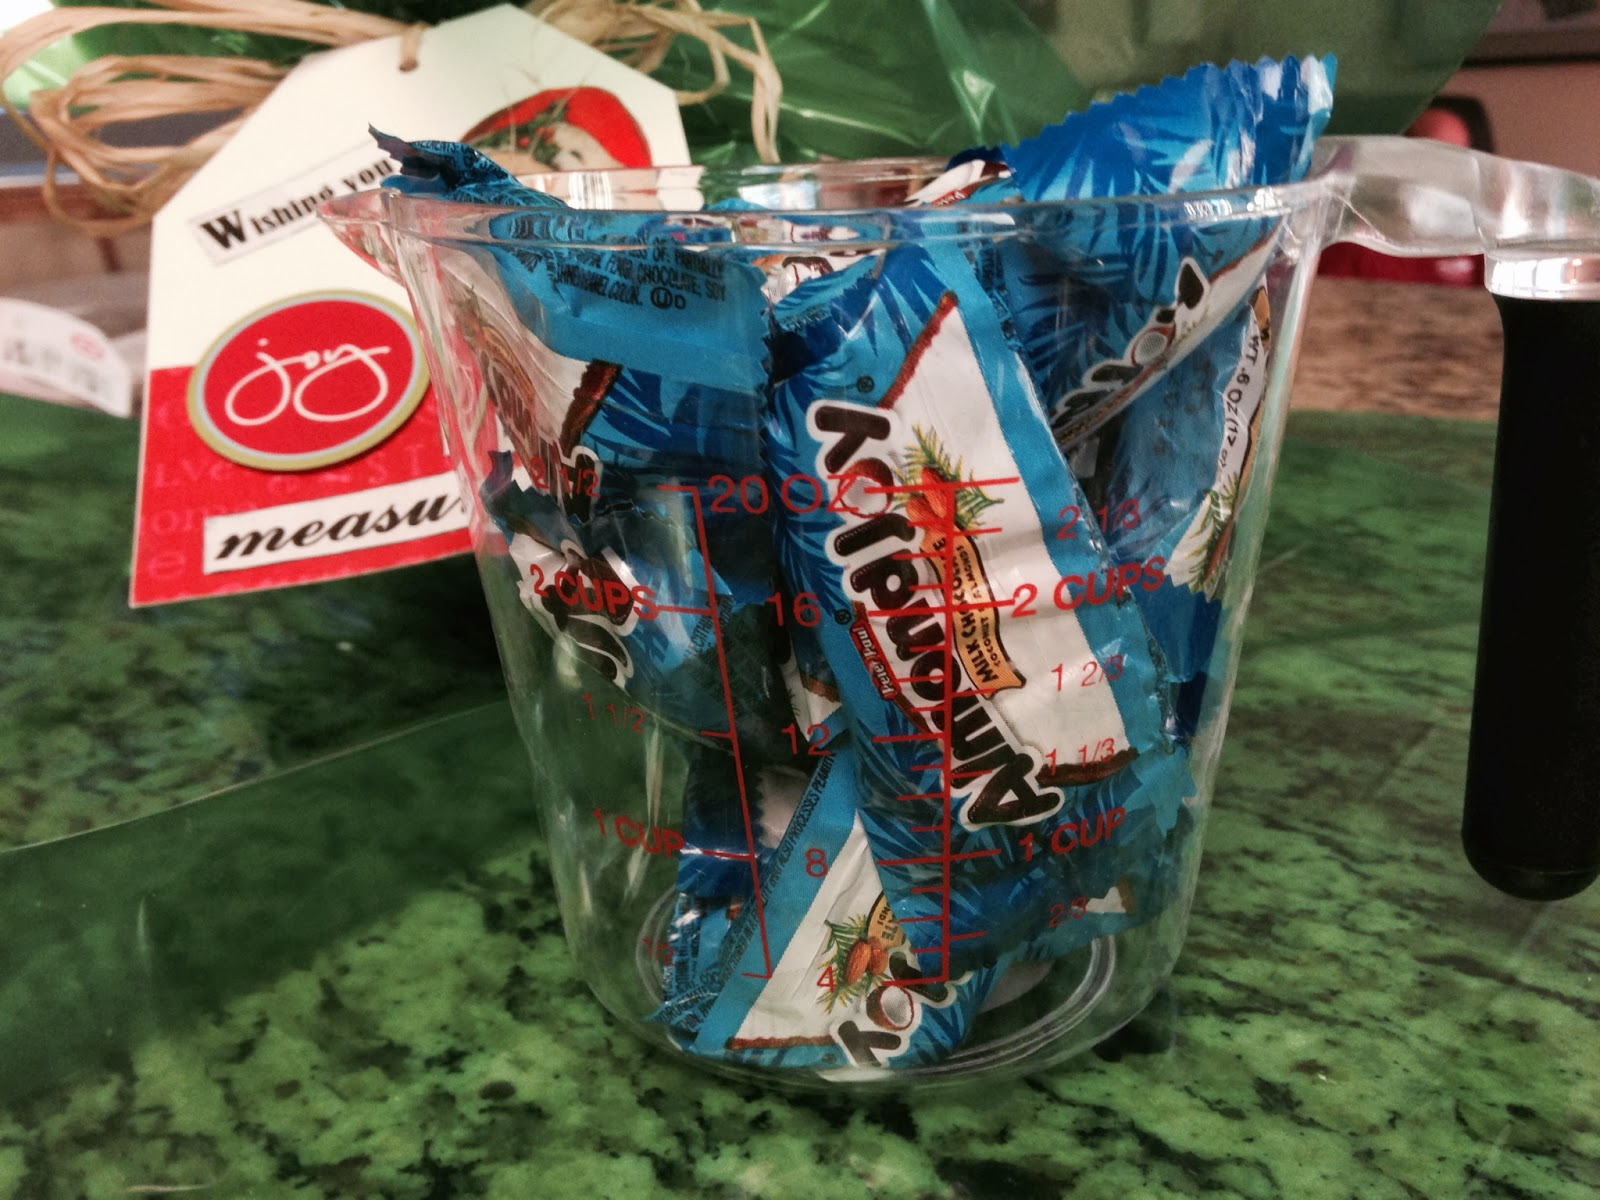 xoxo Grandma: Christmas Neighbor Gift Ideas, Part 2